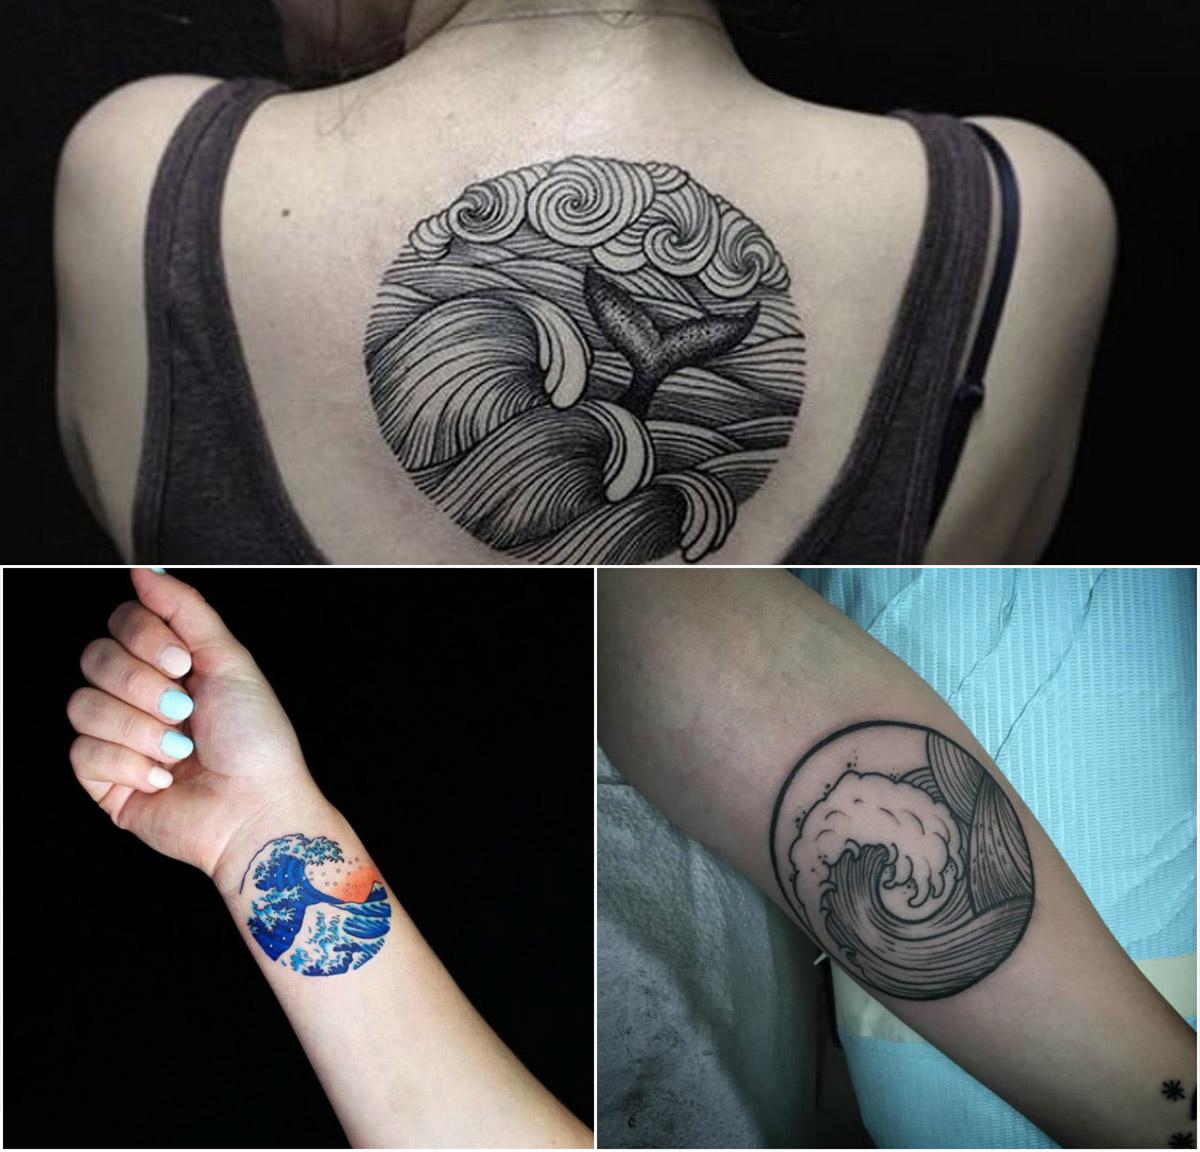 wave-tattoos-rectangularcontainment